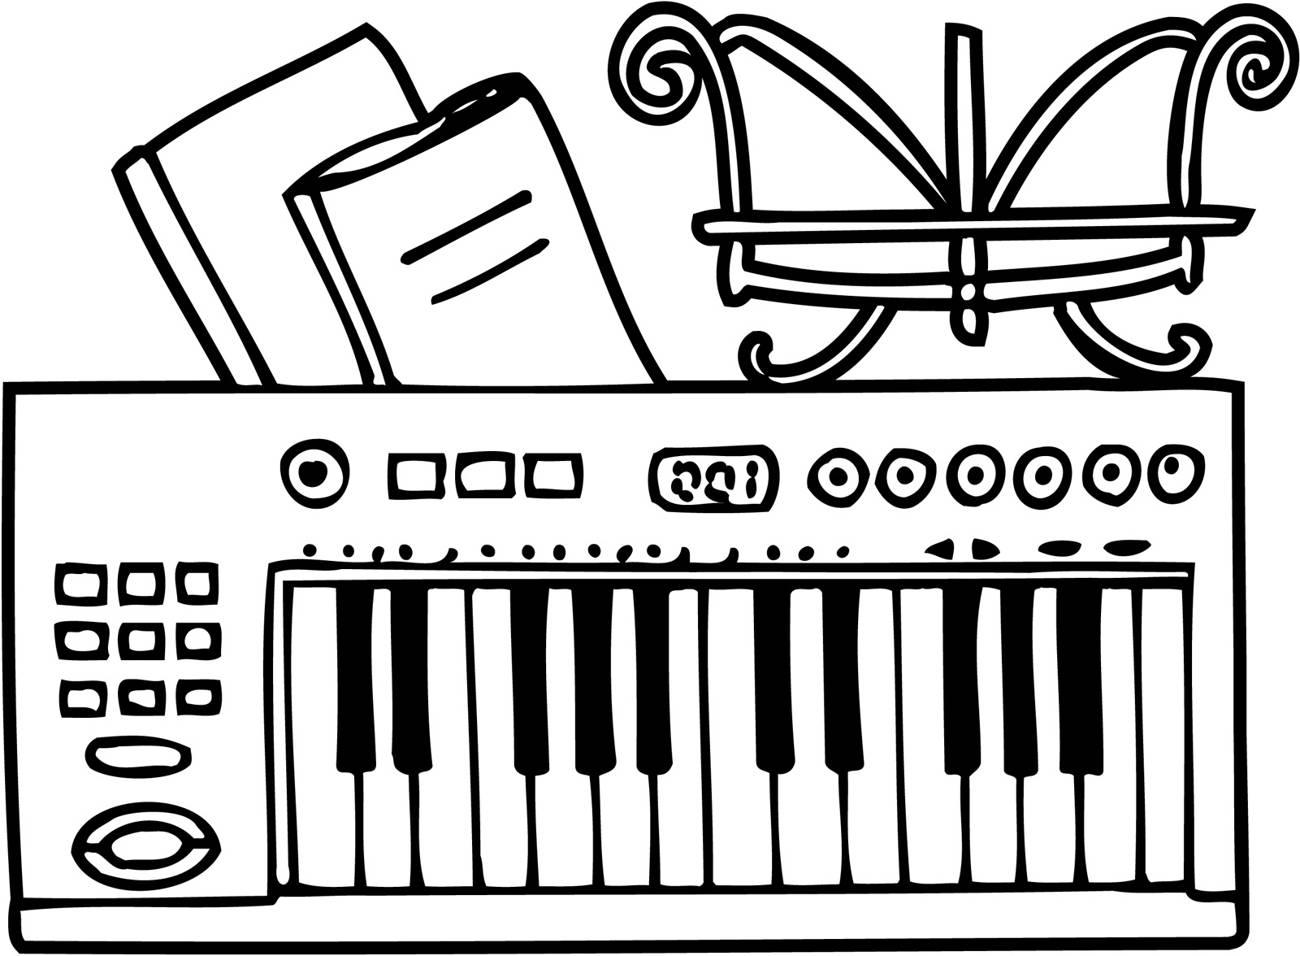 MUSIC-098